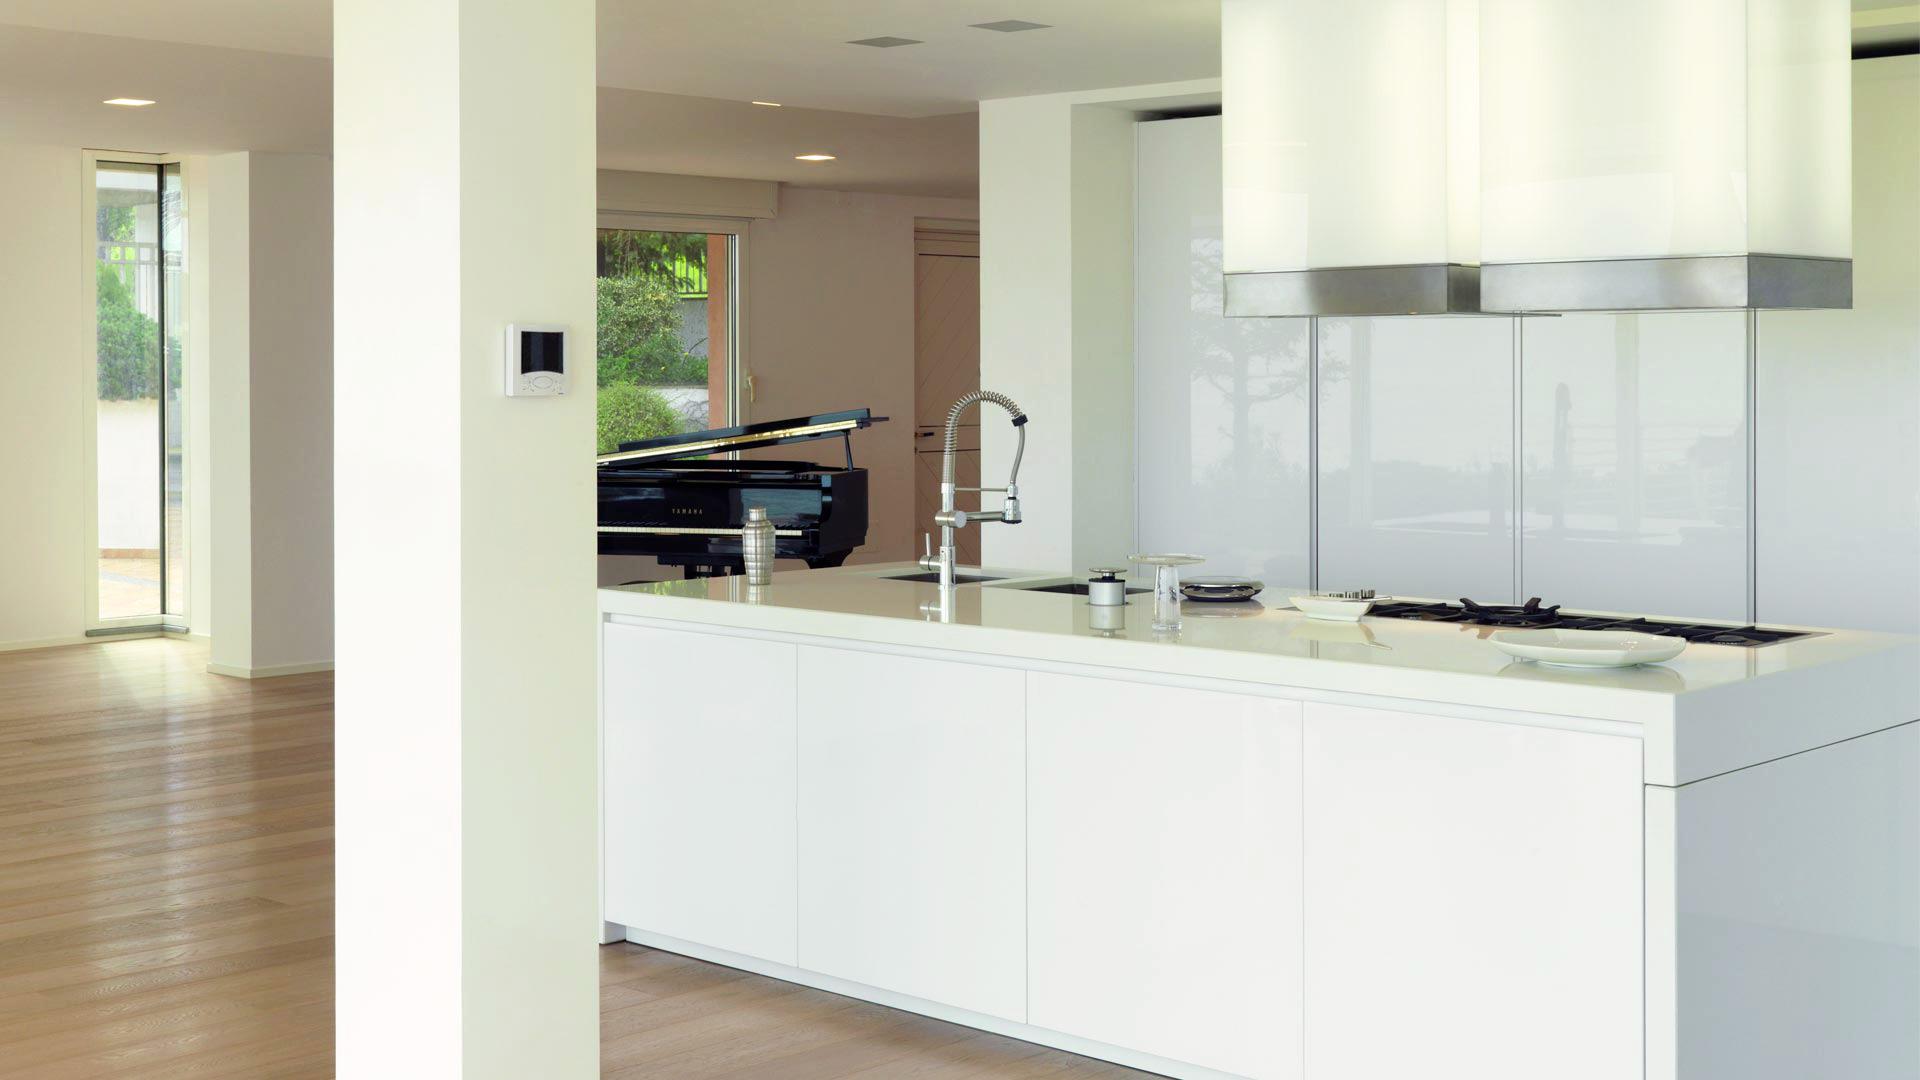 Cucina living open space con tavolo a scomparsa estraibile - Cucina open space con isola ...